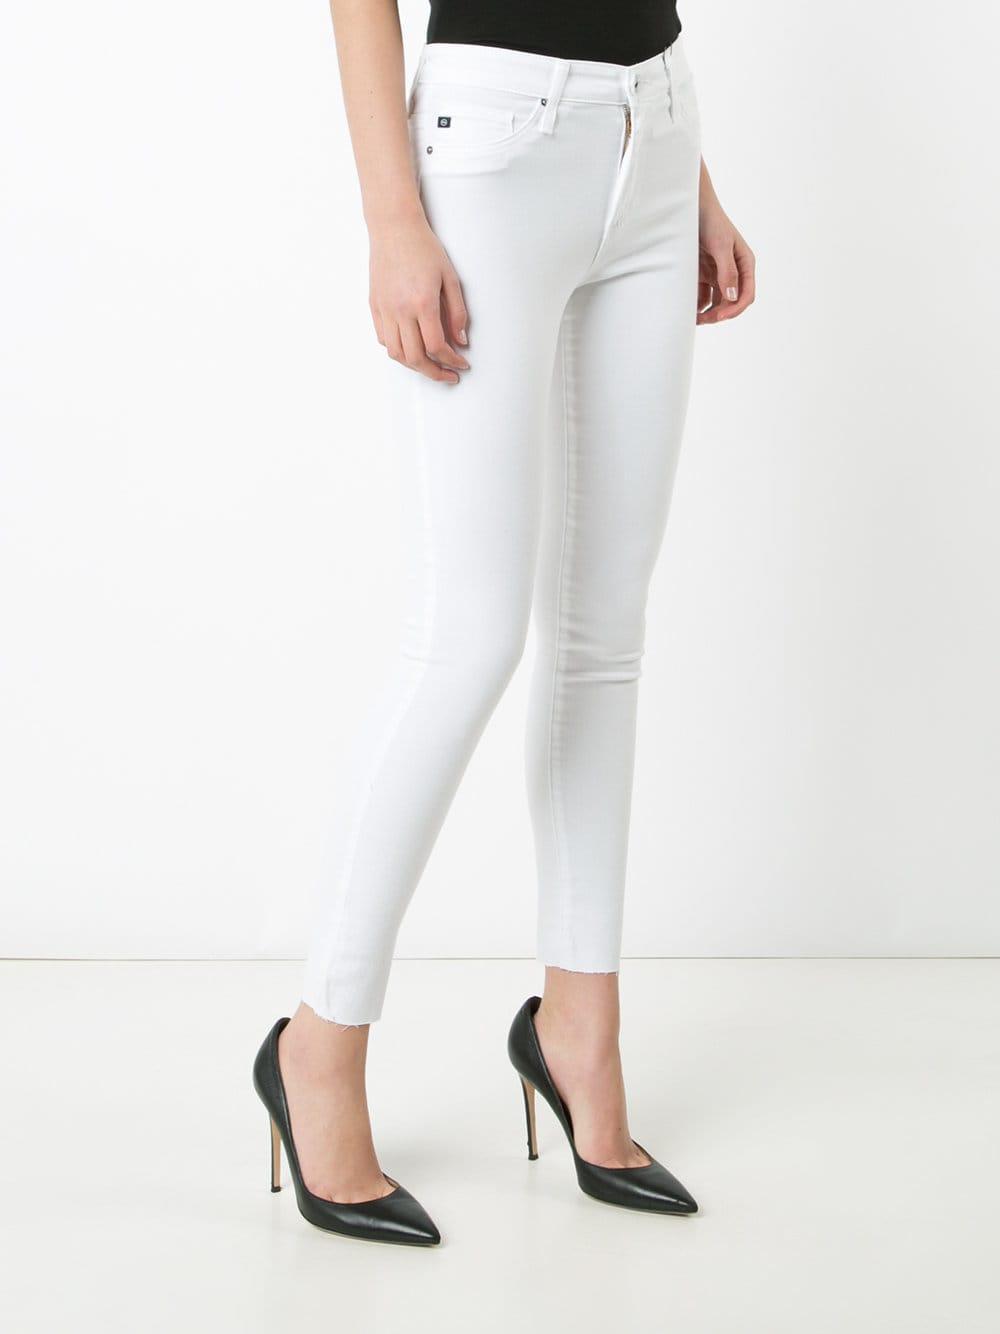 AG Jeans Denim Cropped Super Skinny Jeans in White